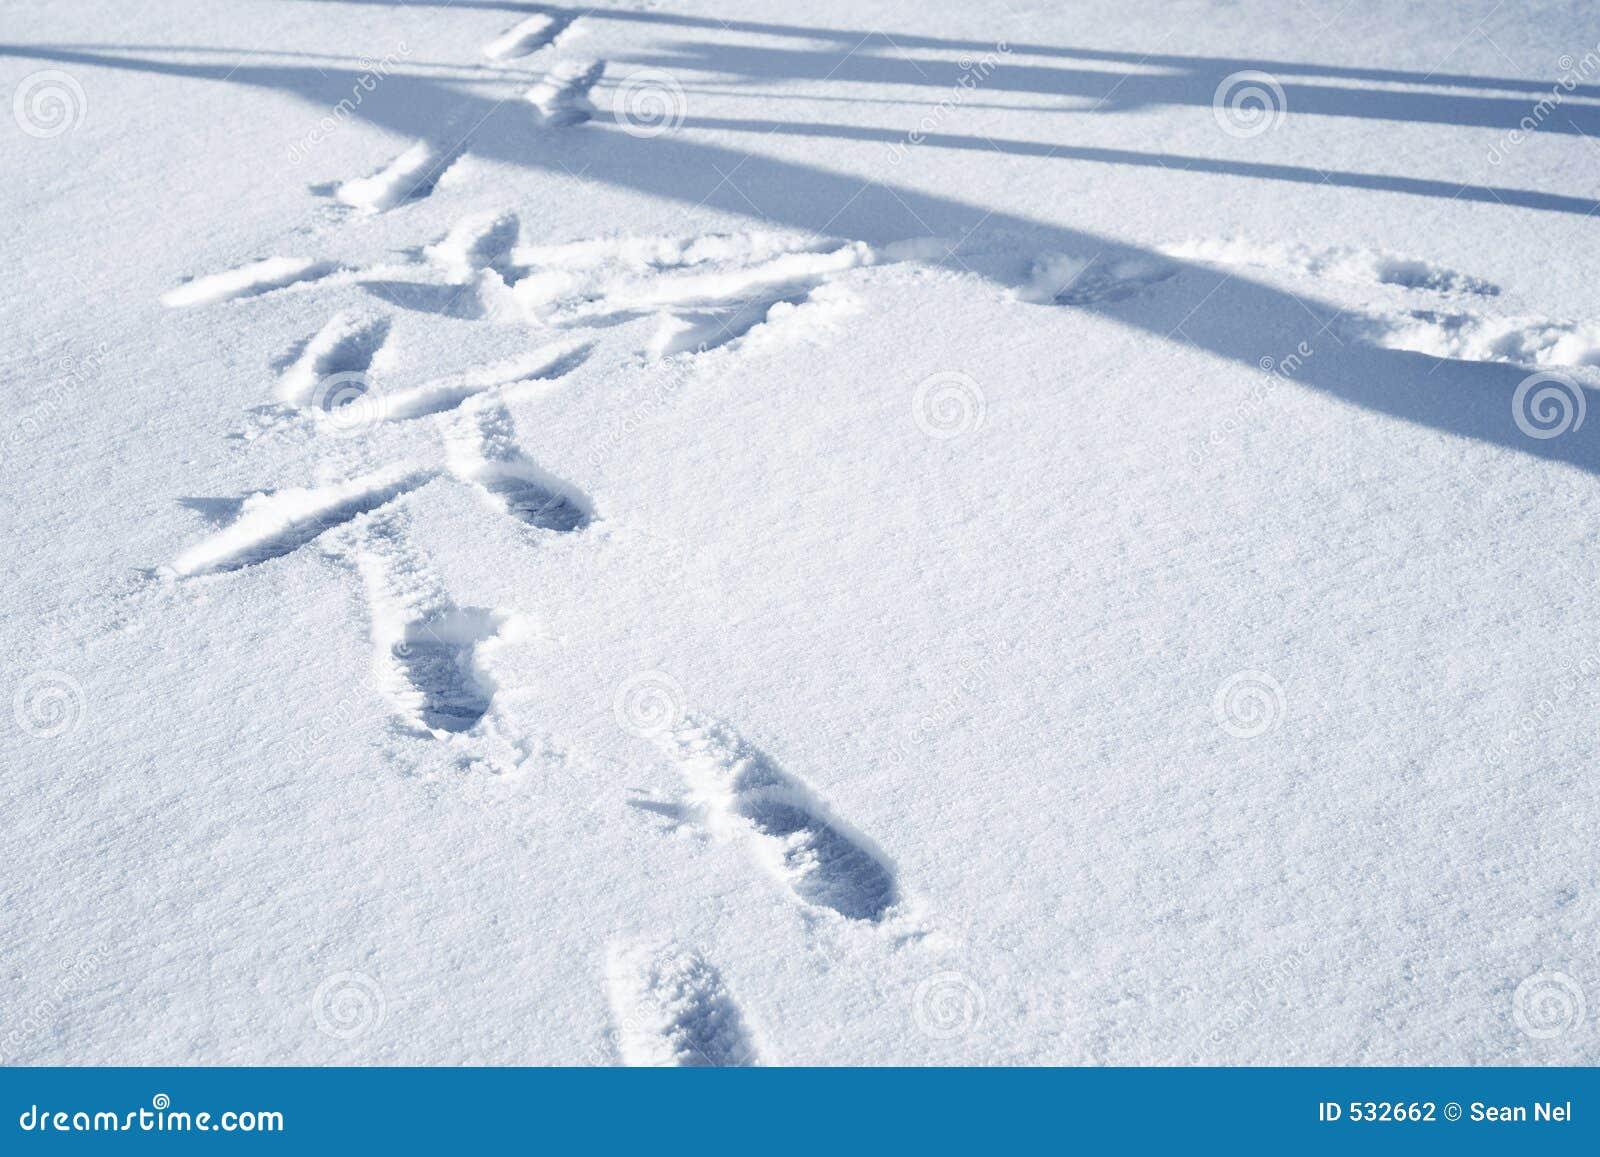 Download 02慕尼黑 库存照片. 图片 包括有 按蚊, 冬天, 人们, 脚印, 冰冷, 蓝色, 冷颤, 背包, 未知, 人员 - 532662